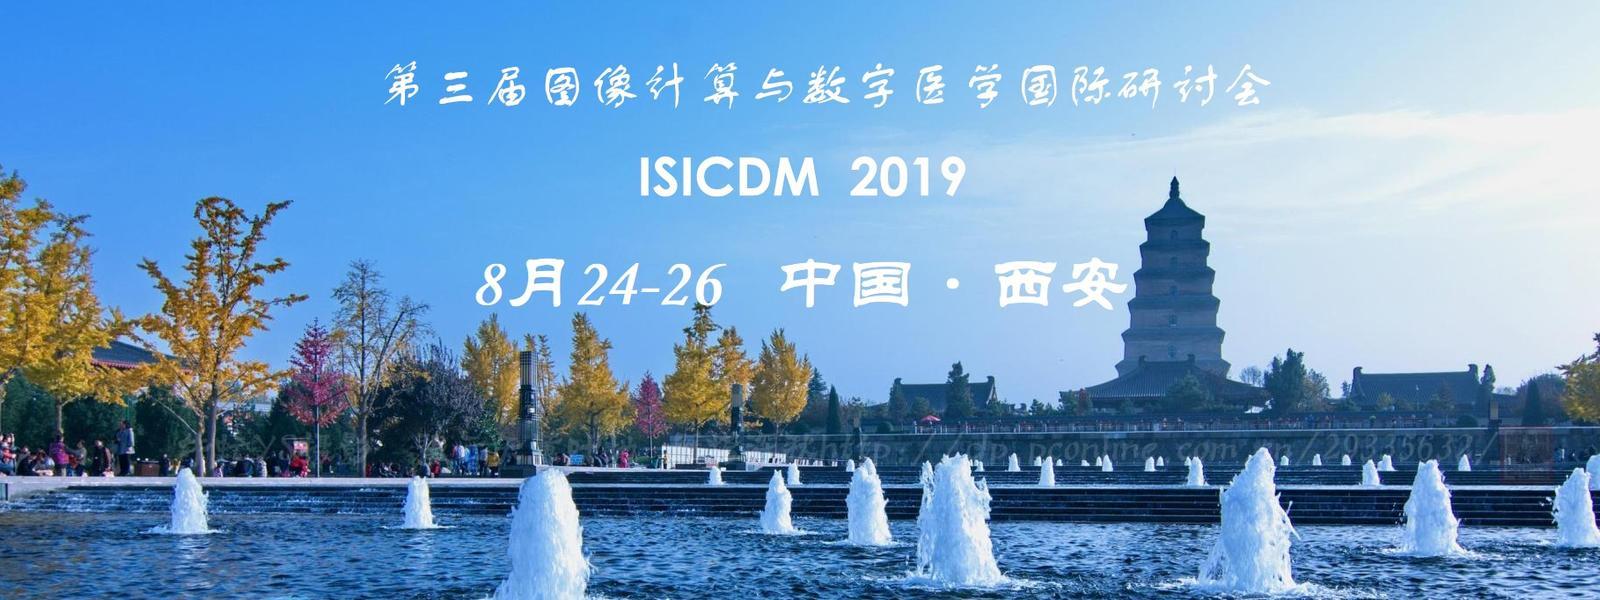 ISICDM 2019-1.jpg